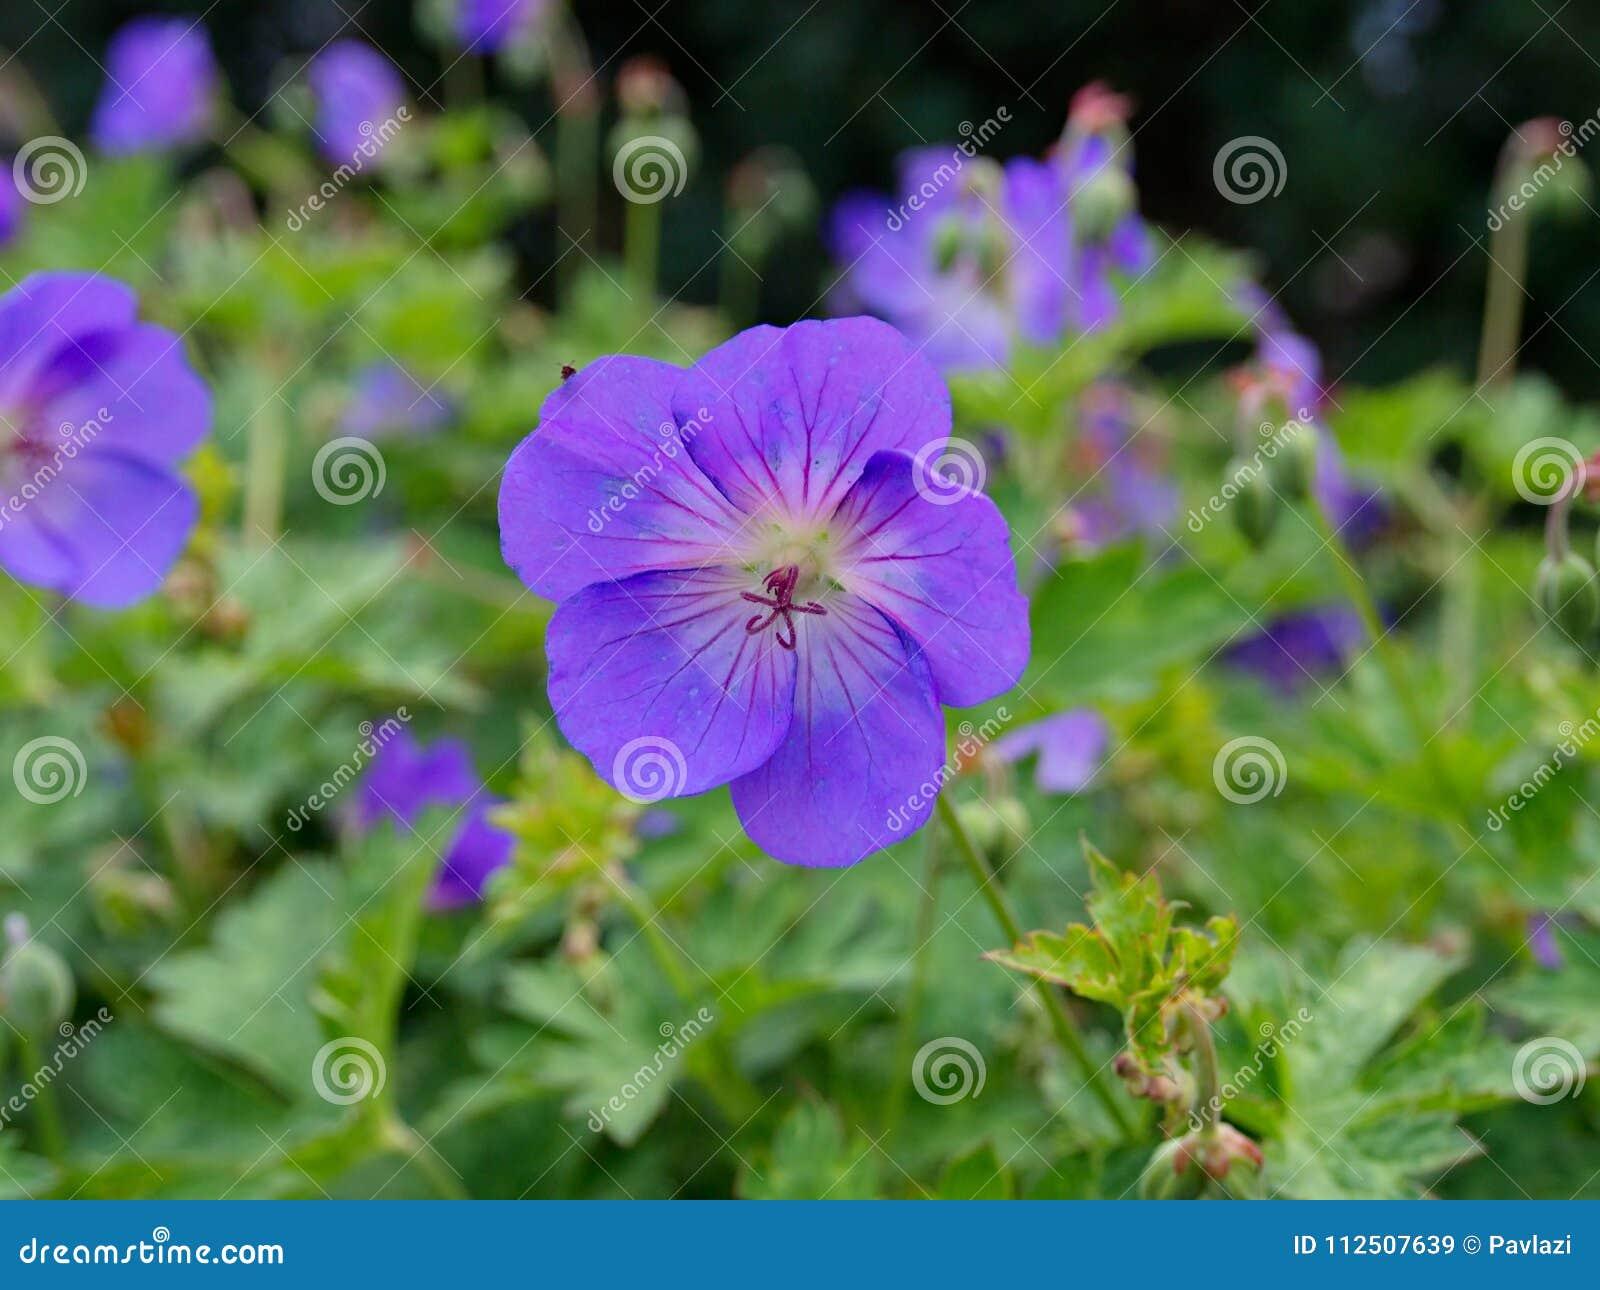 Blue violet flower of cranesbill geranium stock image image of download blue violet flower of cranesbill geranium stock image image of garden cultivar izmirmasajfo